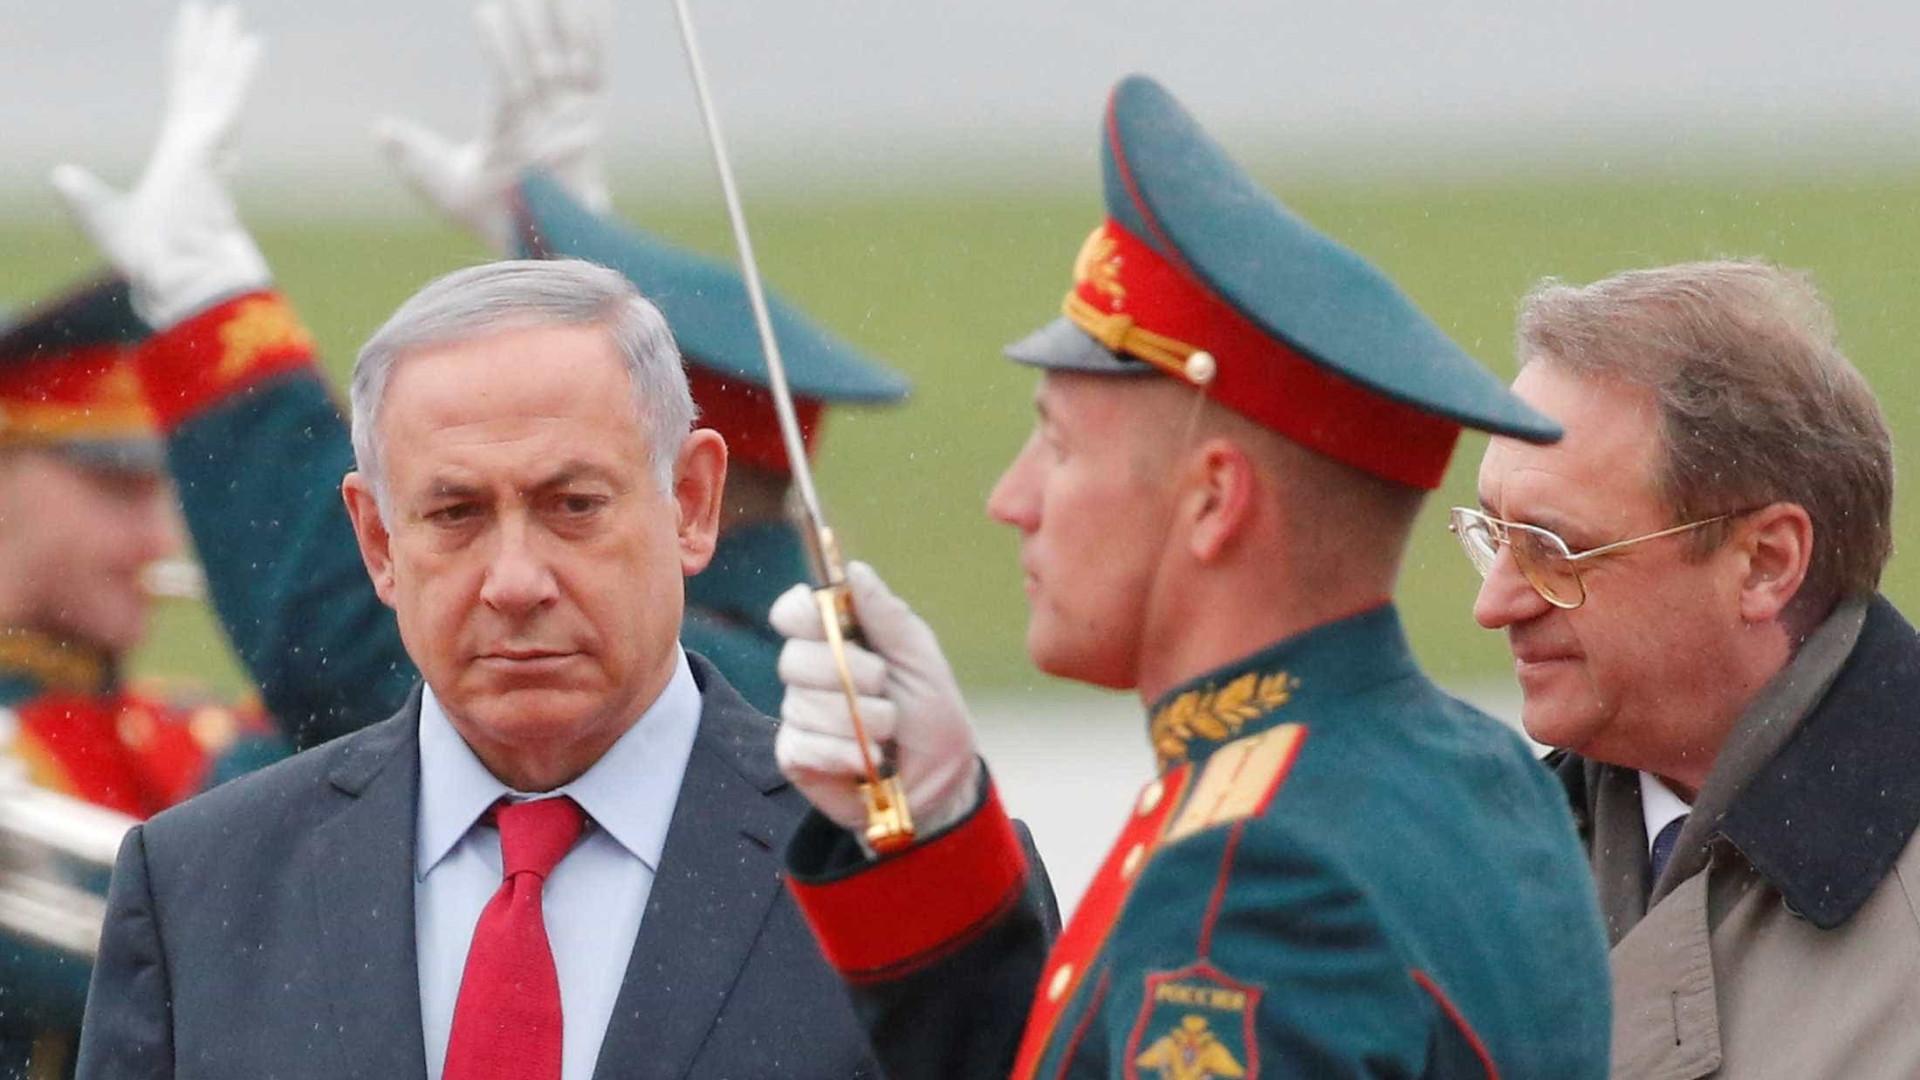 Rússia chamou embaixador de Israel após bombardeamento perto de Palmira